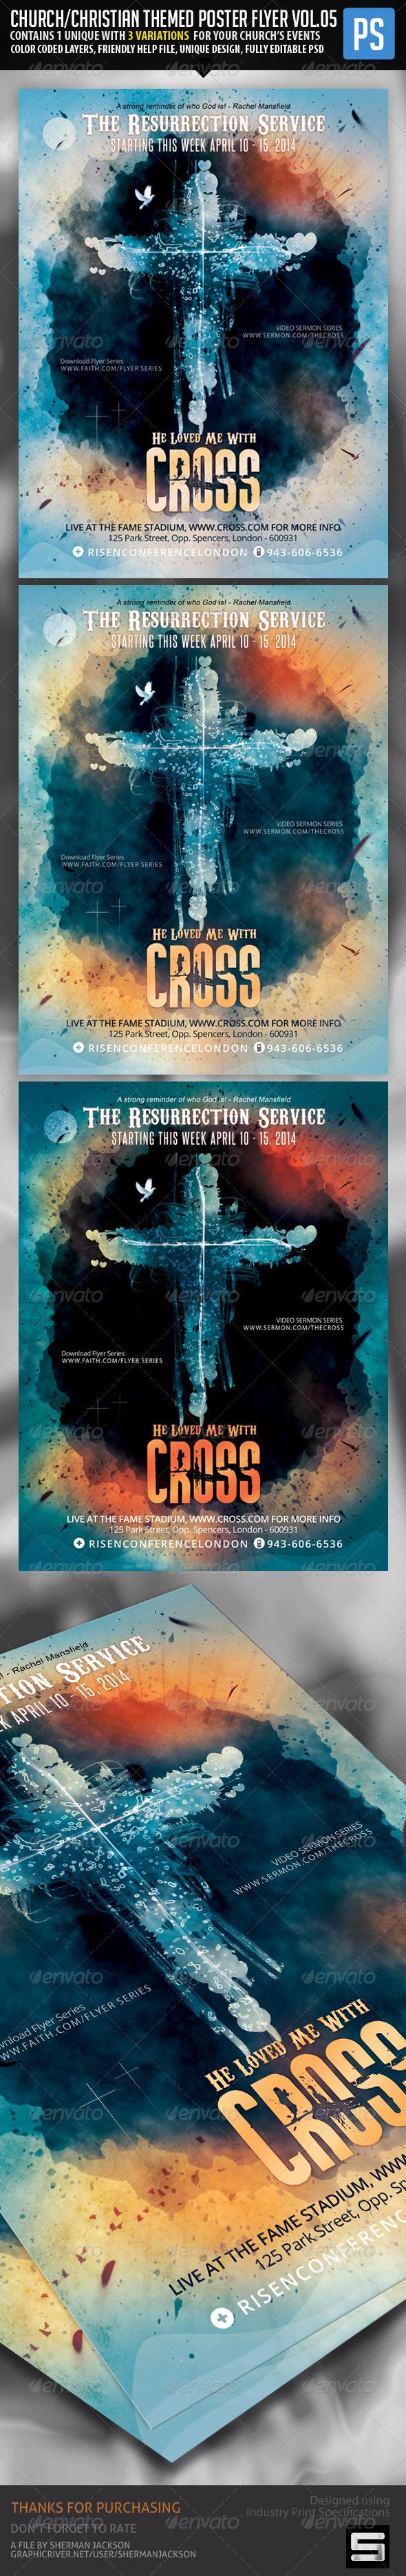 Church Christian Themed Poster Flyer Vol.5